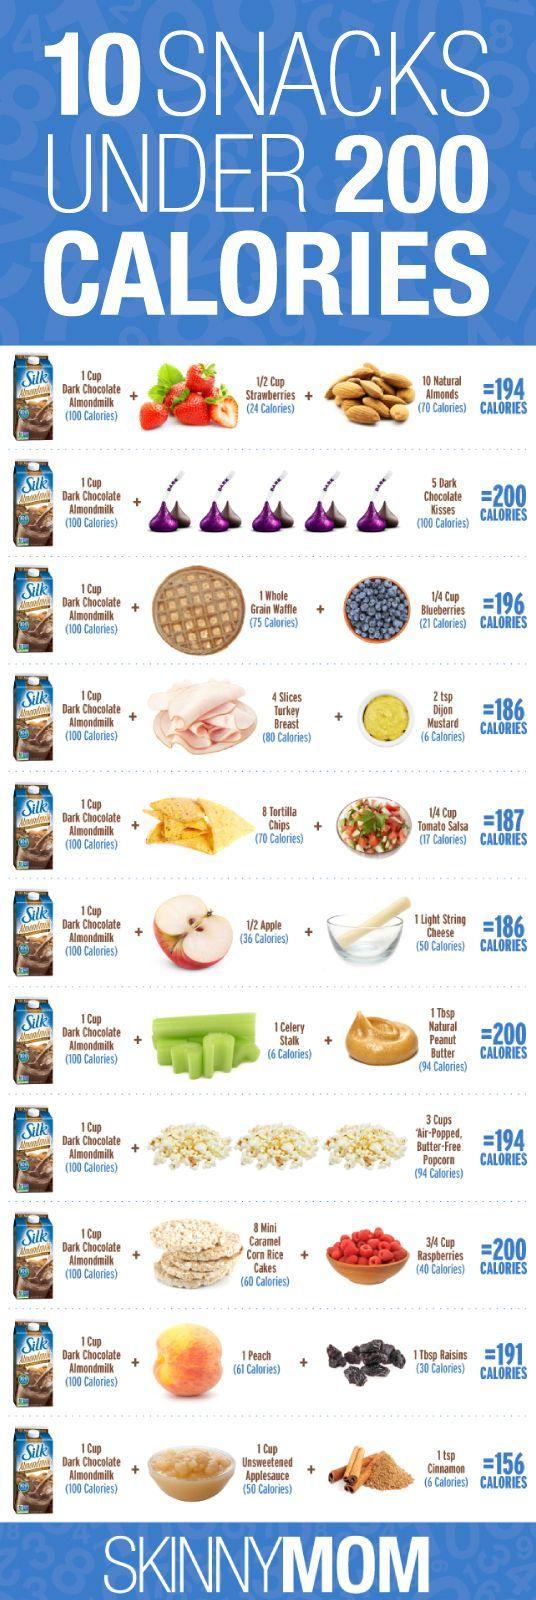 Diabetics Who Enjoy Food: 10 Snacks Under 200 Calories with Silk